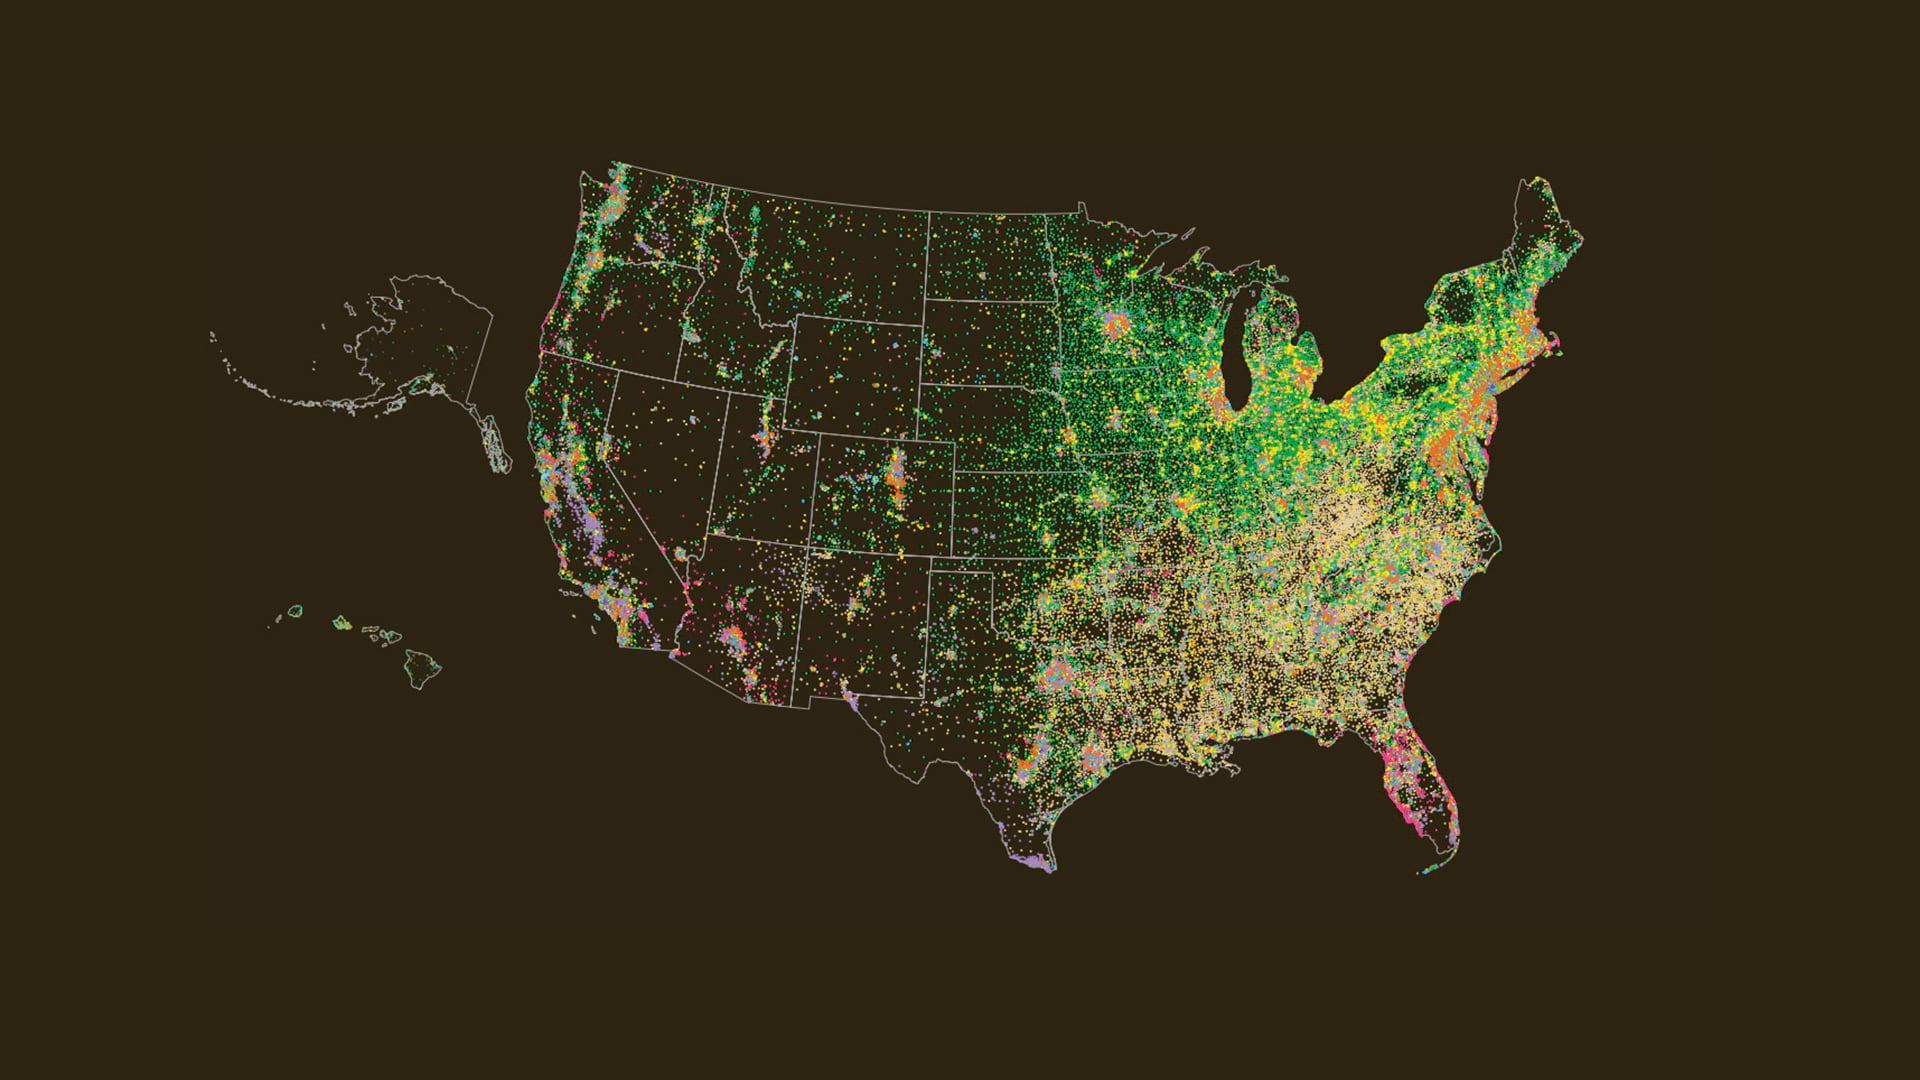 Tapestry Segmentation classifies US neighborhoods into 67 different consumer segments